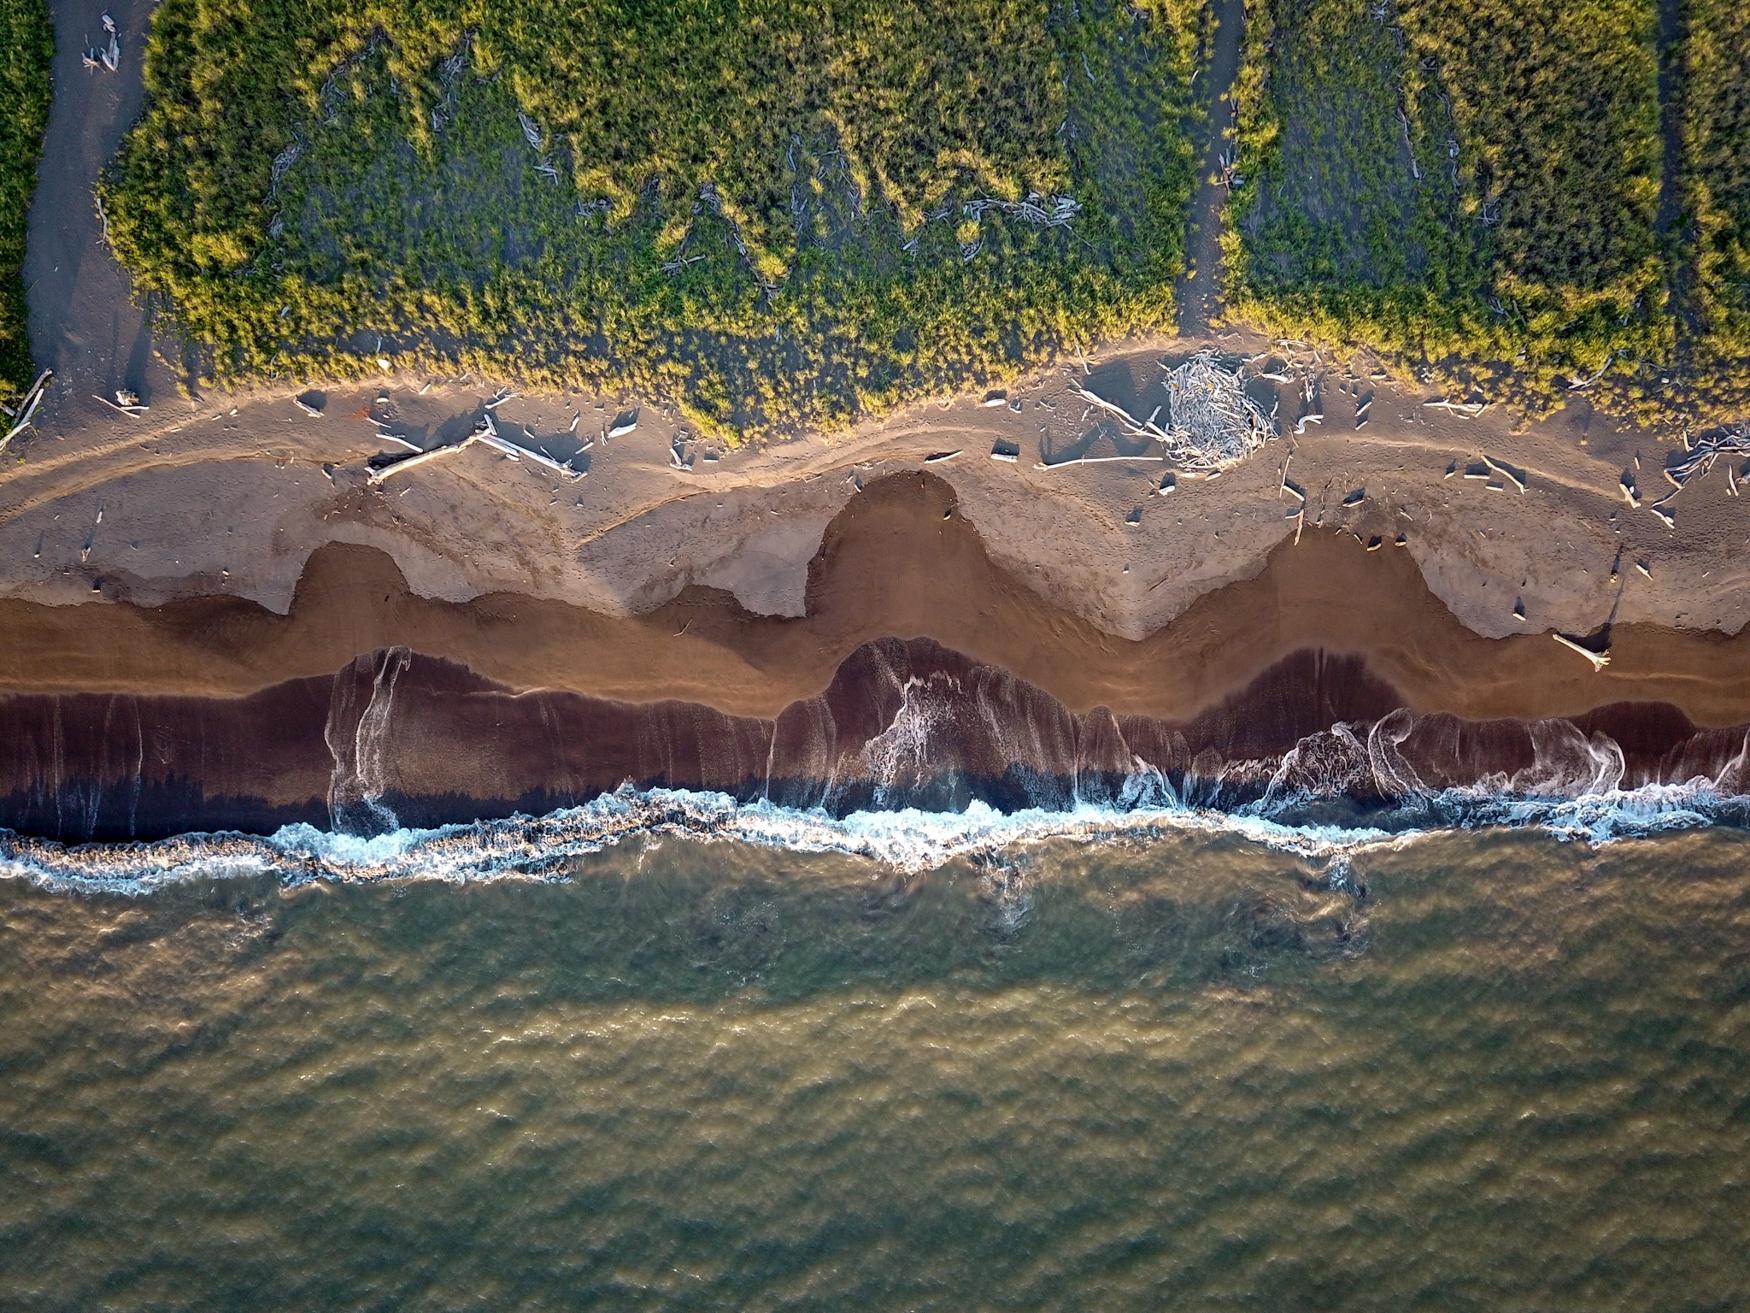 Yoga-Retreat-Drone-Photography-Costa-Rica-32.jpg